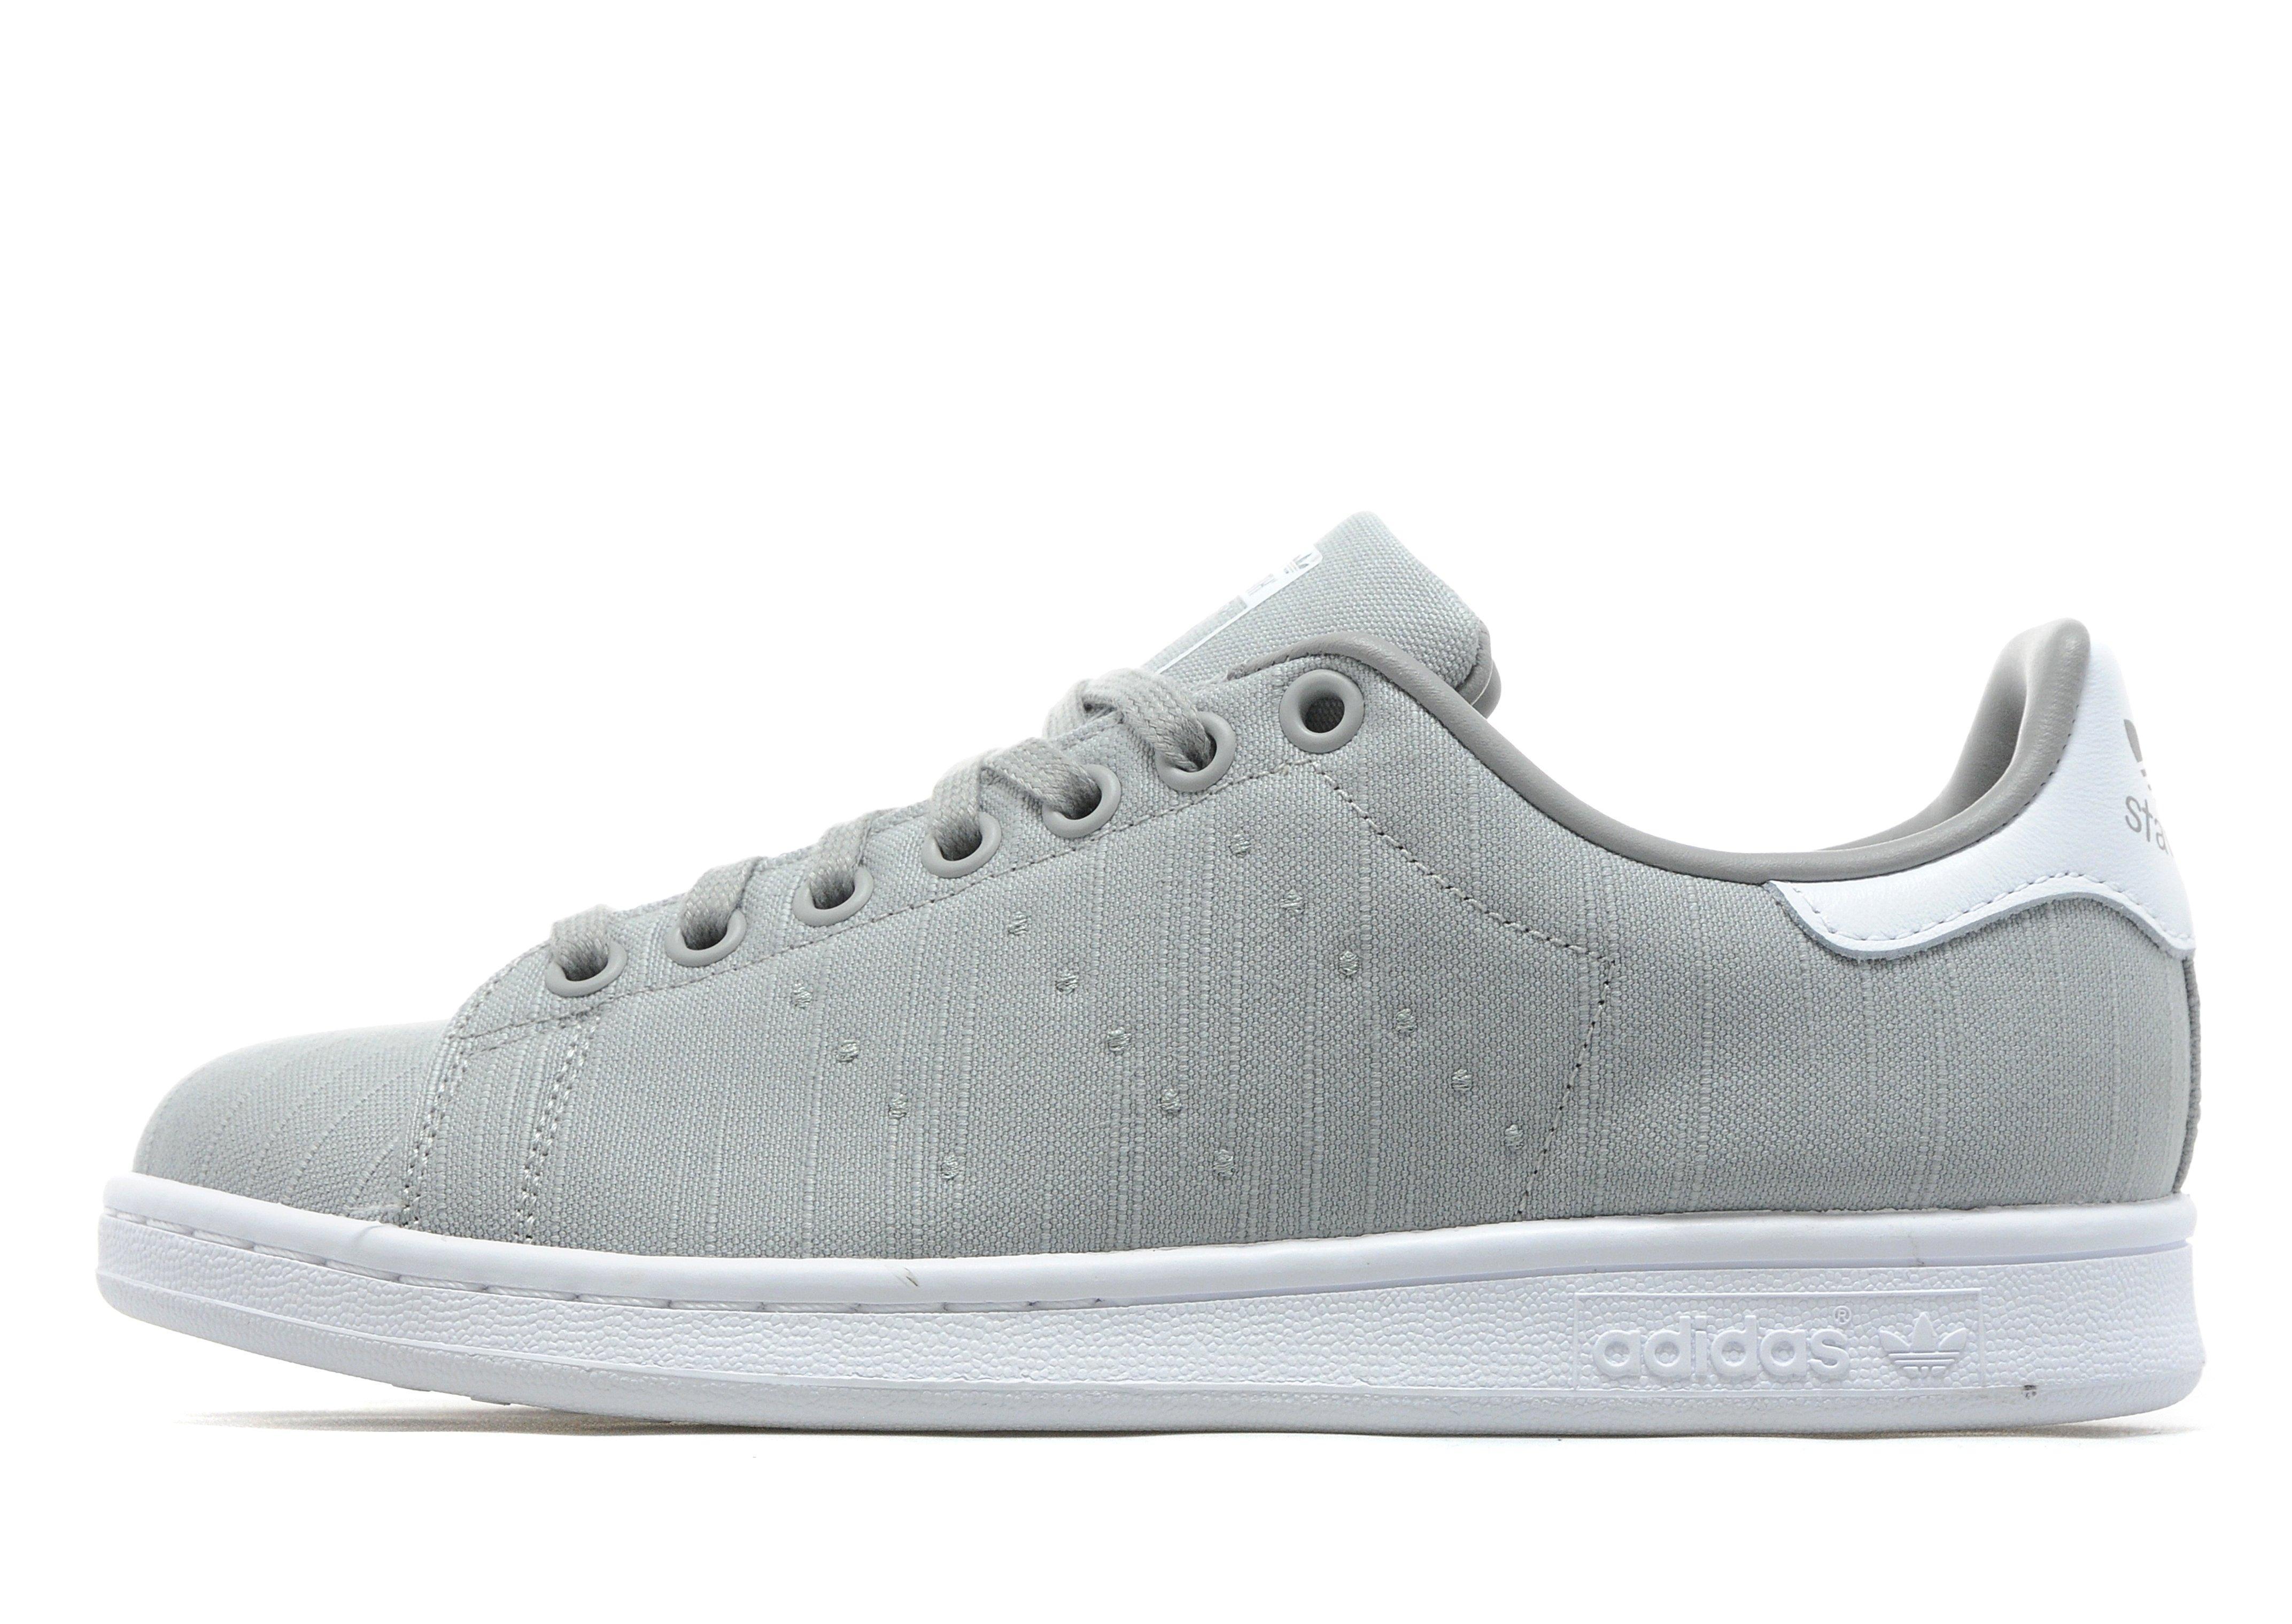 adidas ultra boost 40 triple black uk adidas shoes women stan smith ... 7b0f3c144